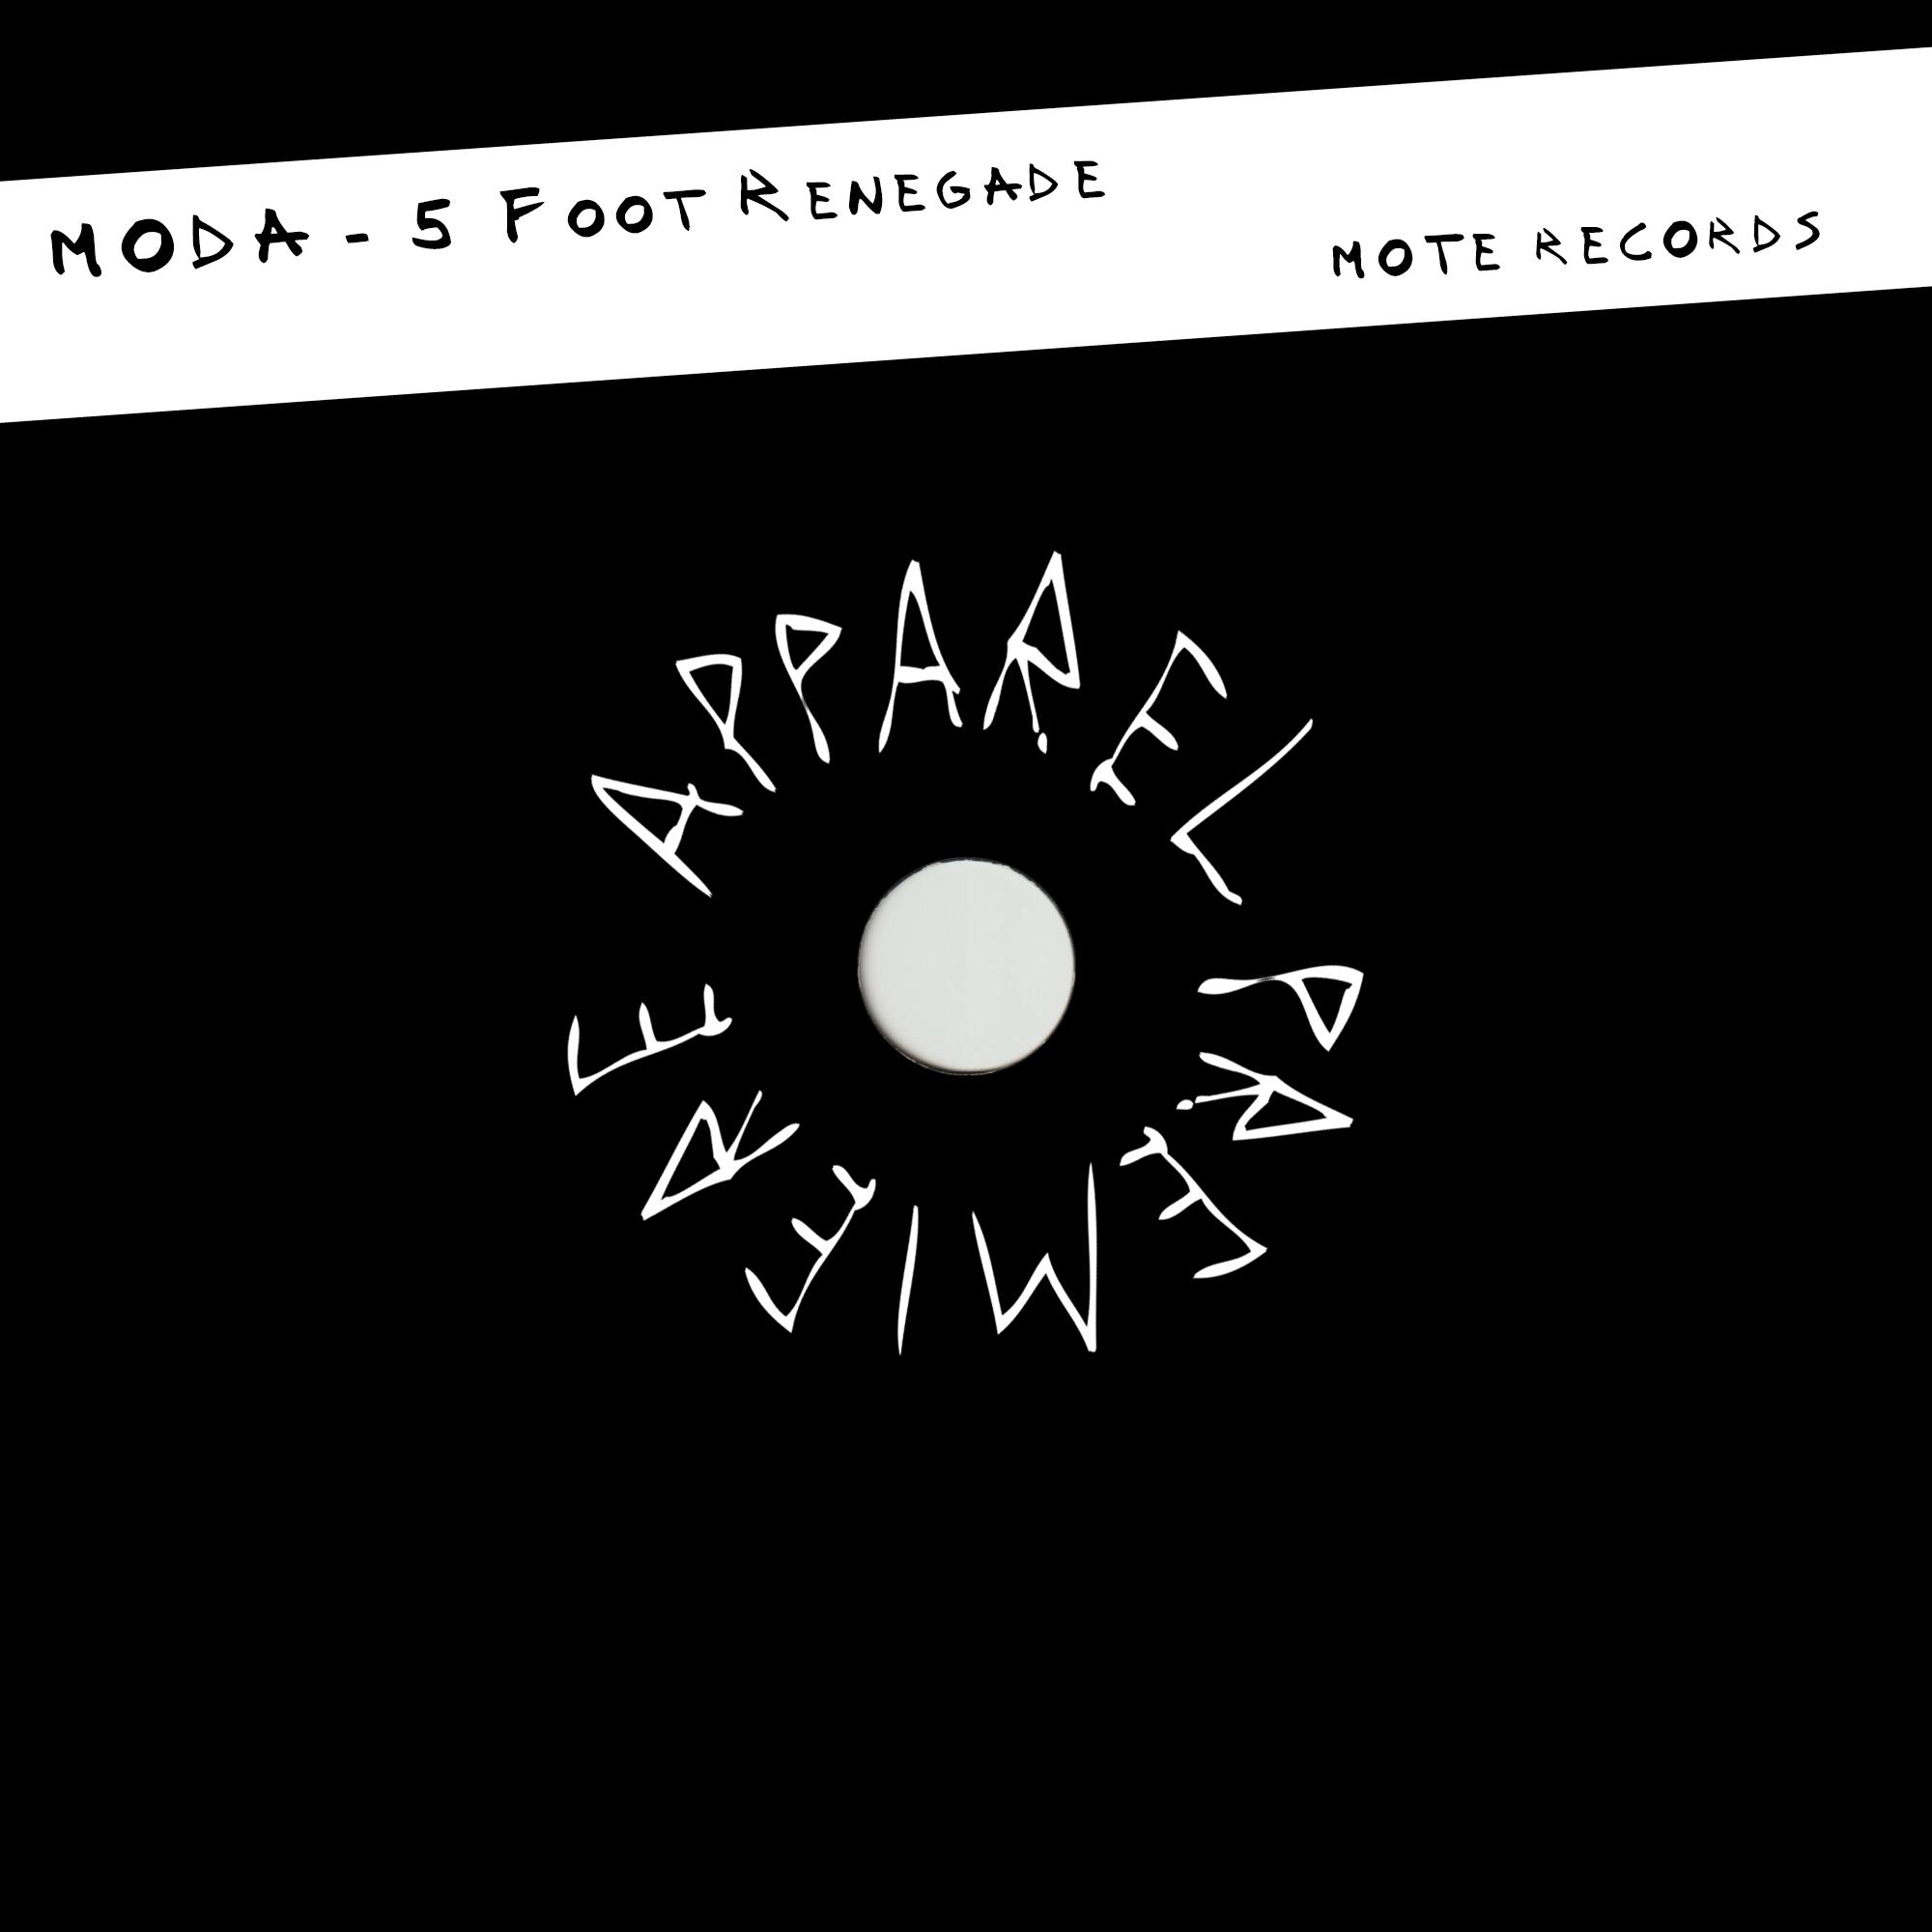 APPAREL PREMIERE MODA – 5 Foot Renegade [MOTE Records]